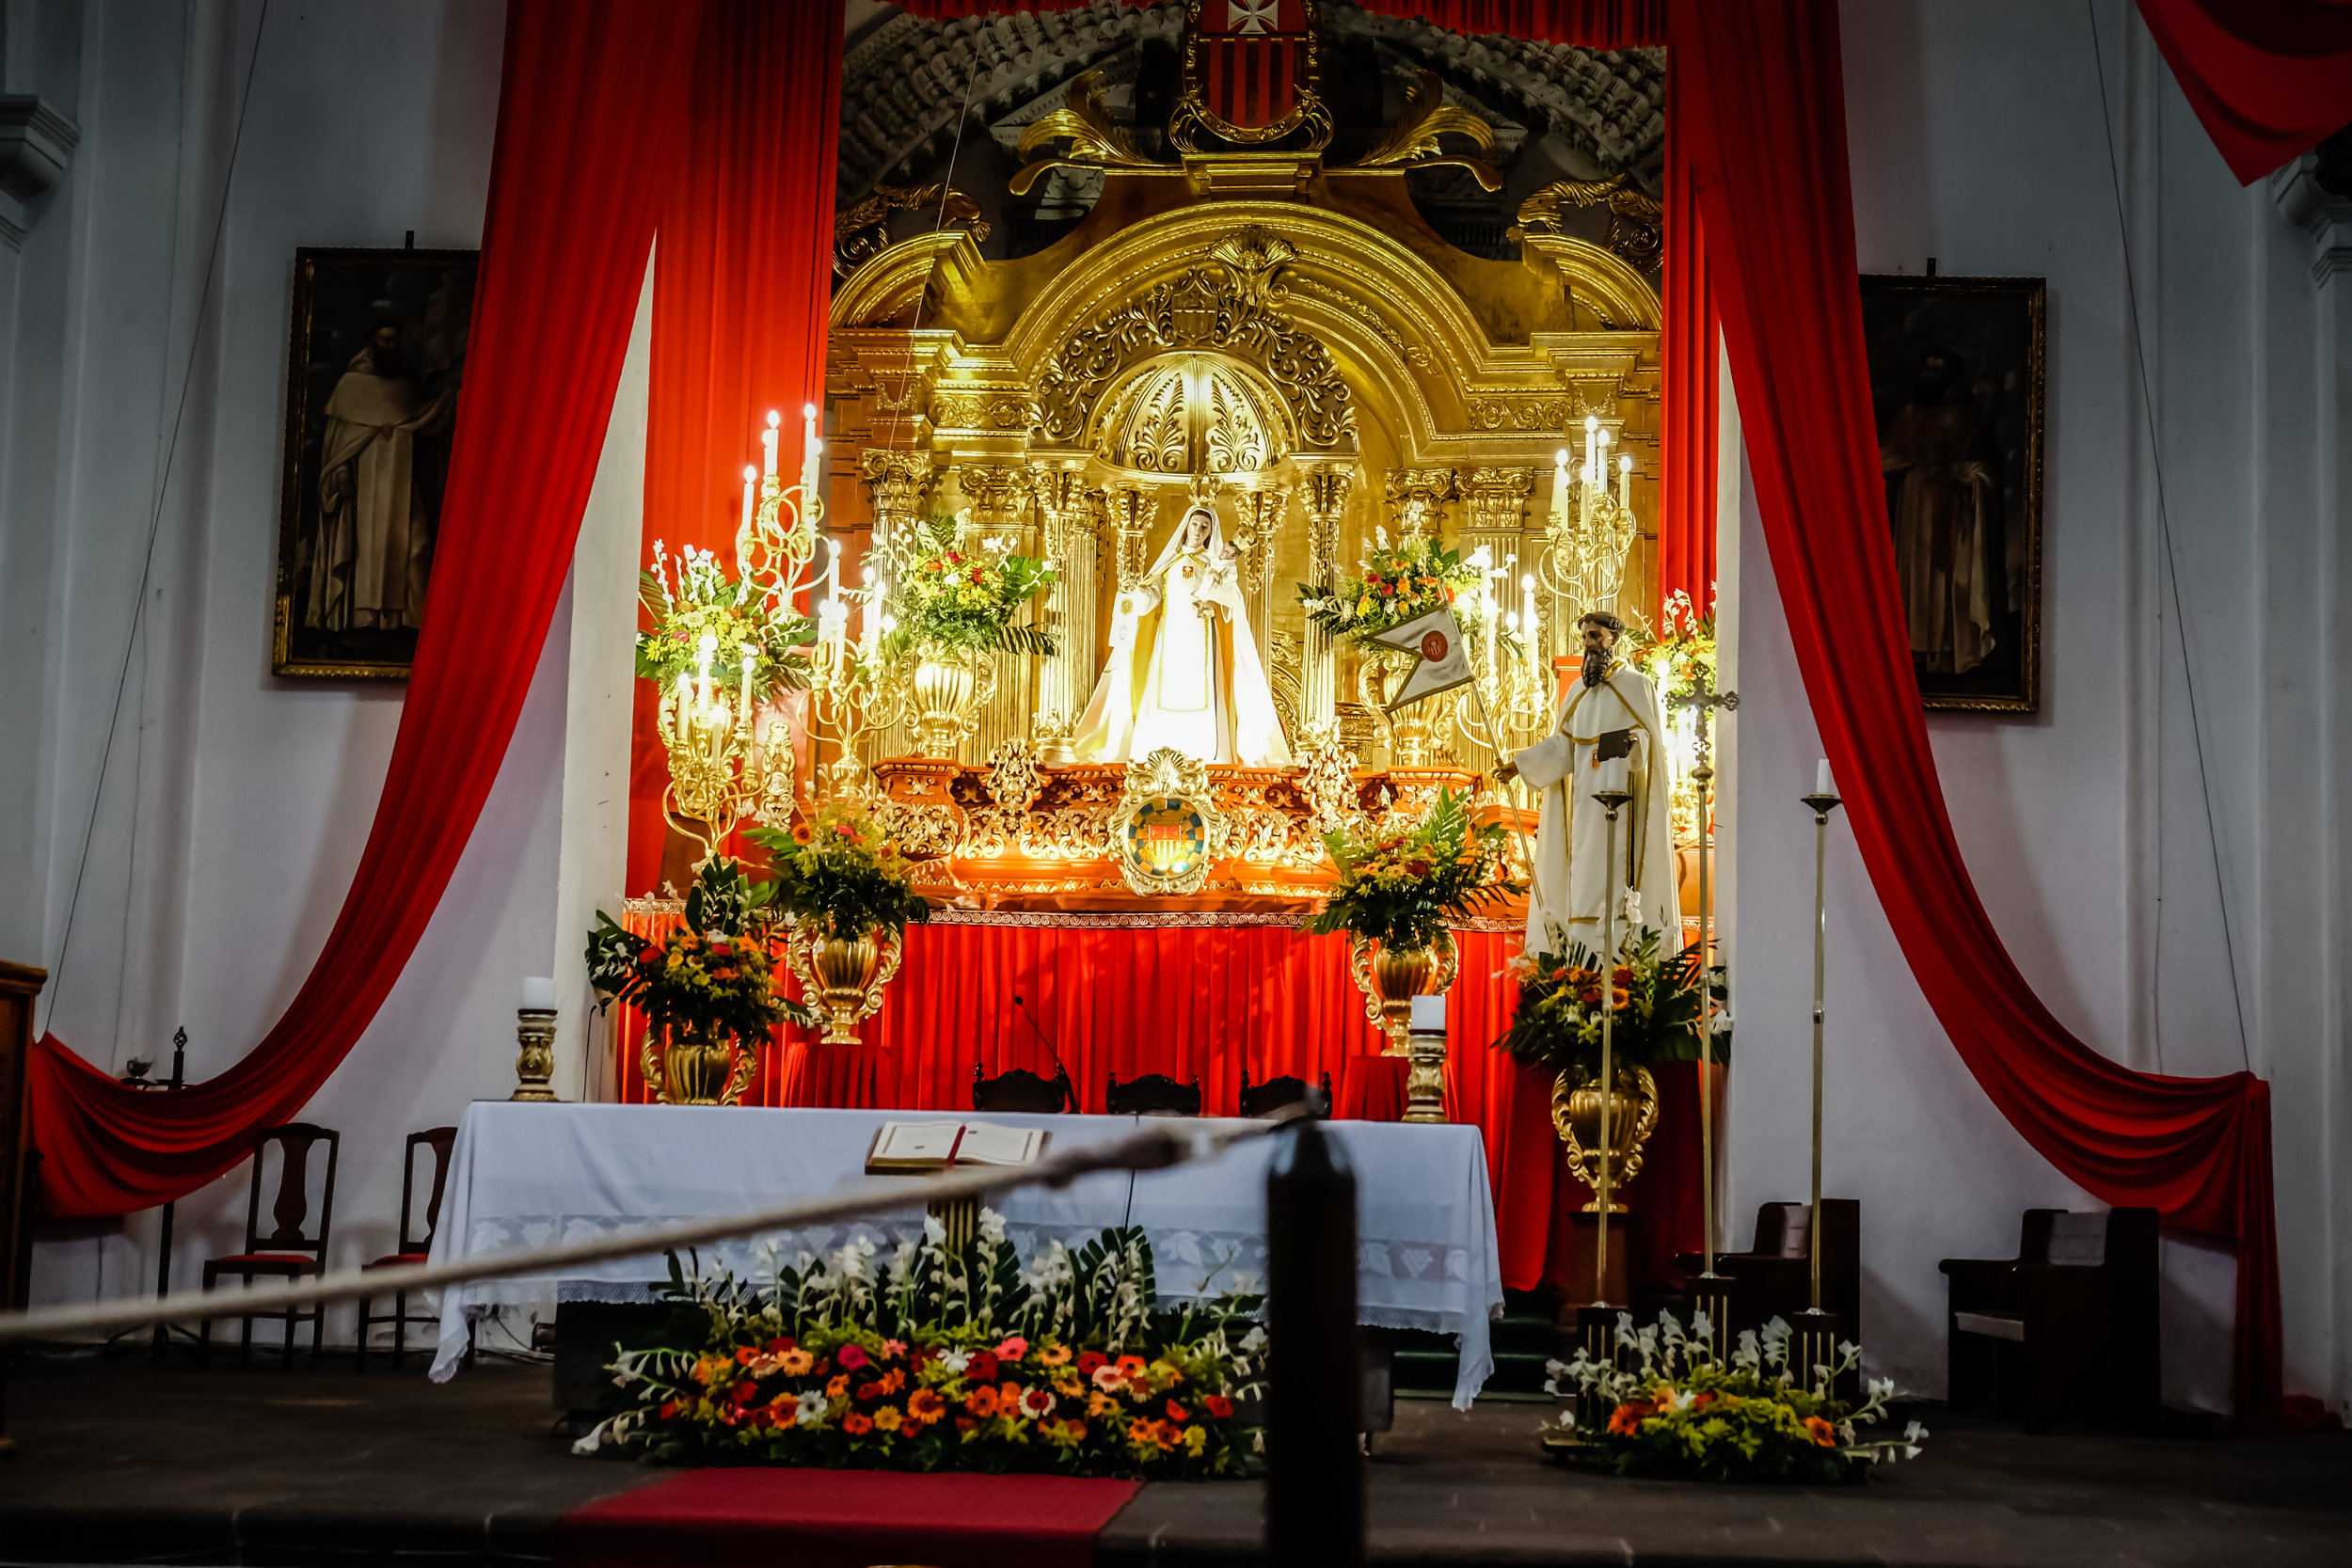 Altar, La Merced Iglesia y Monasterio, Antigua, Guatemala